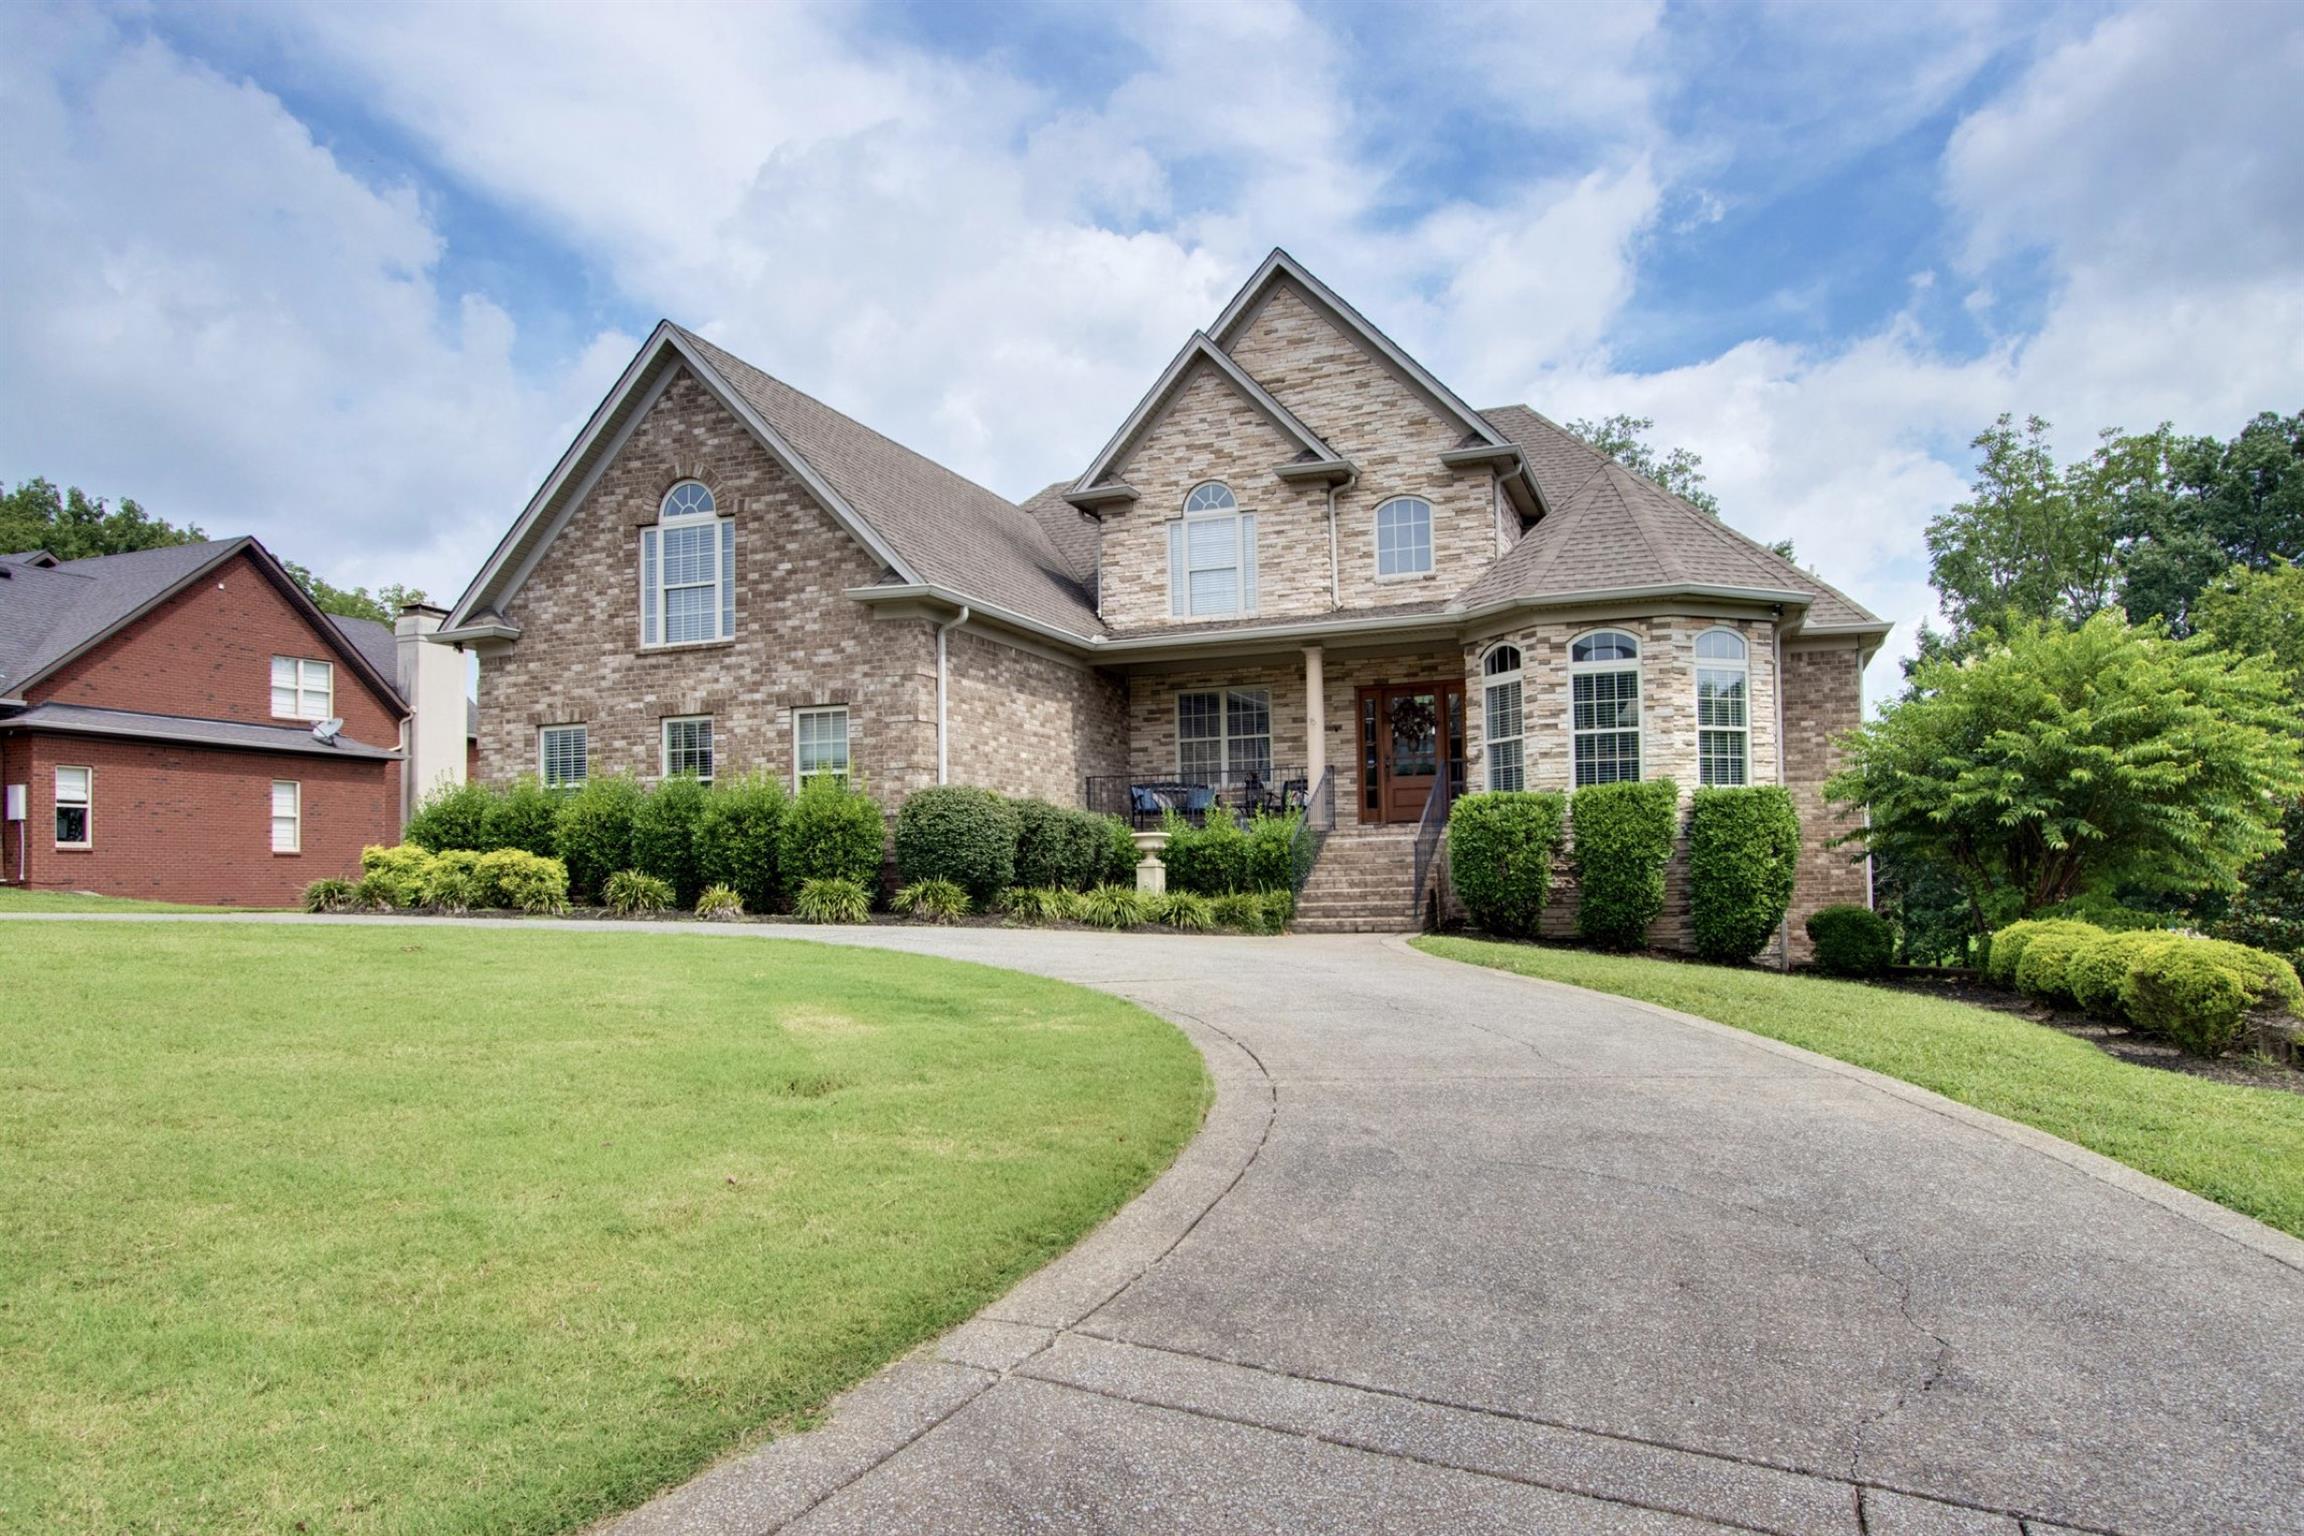 1016 Kidron Way, Hendersonville, TN 37075 - Hendersonville, TN real estate listing